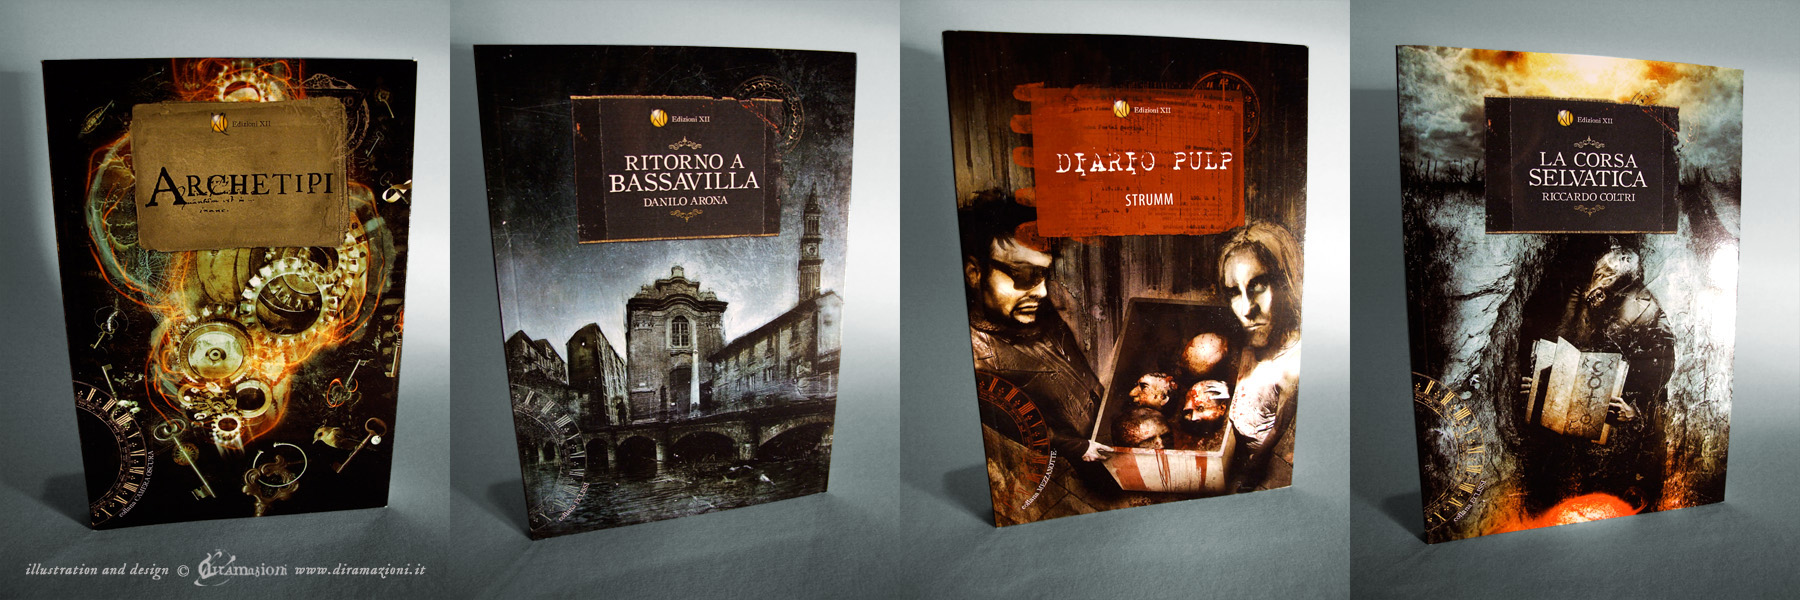 covers-edizioni-xii